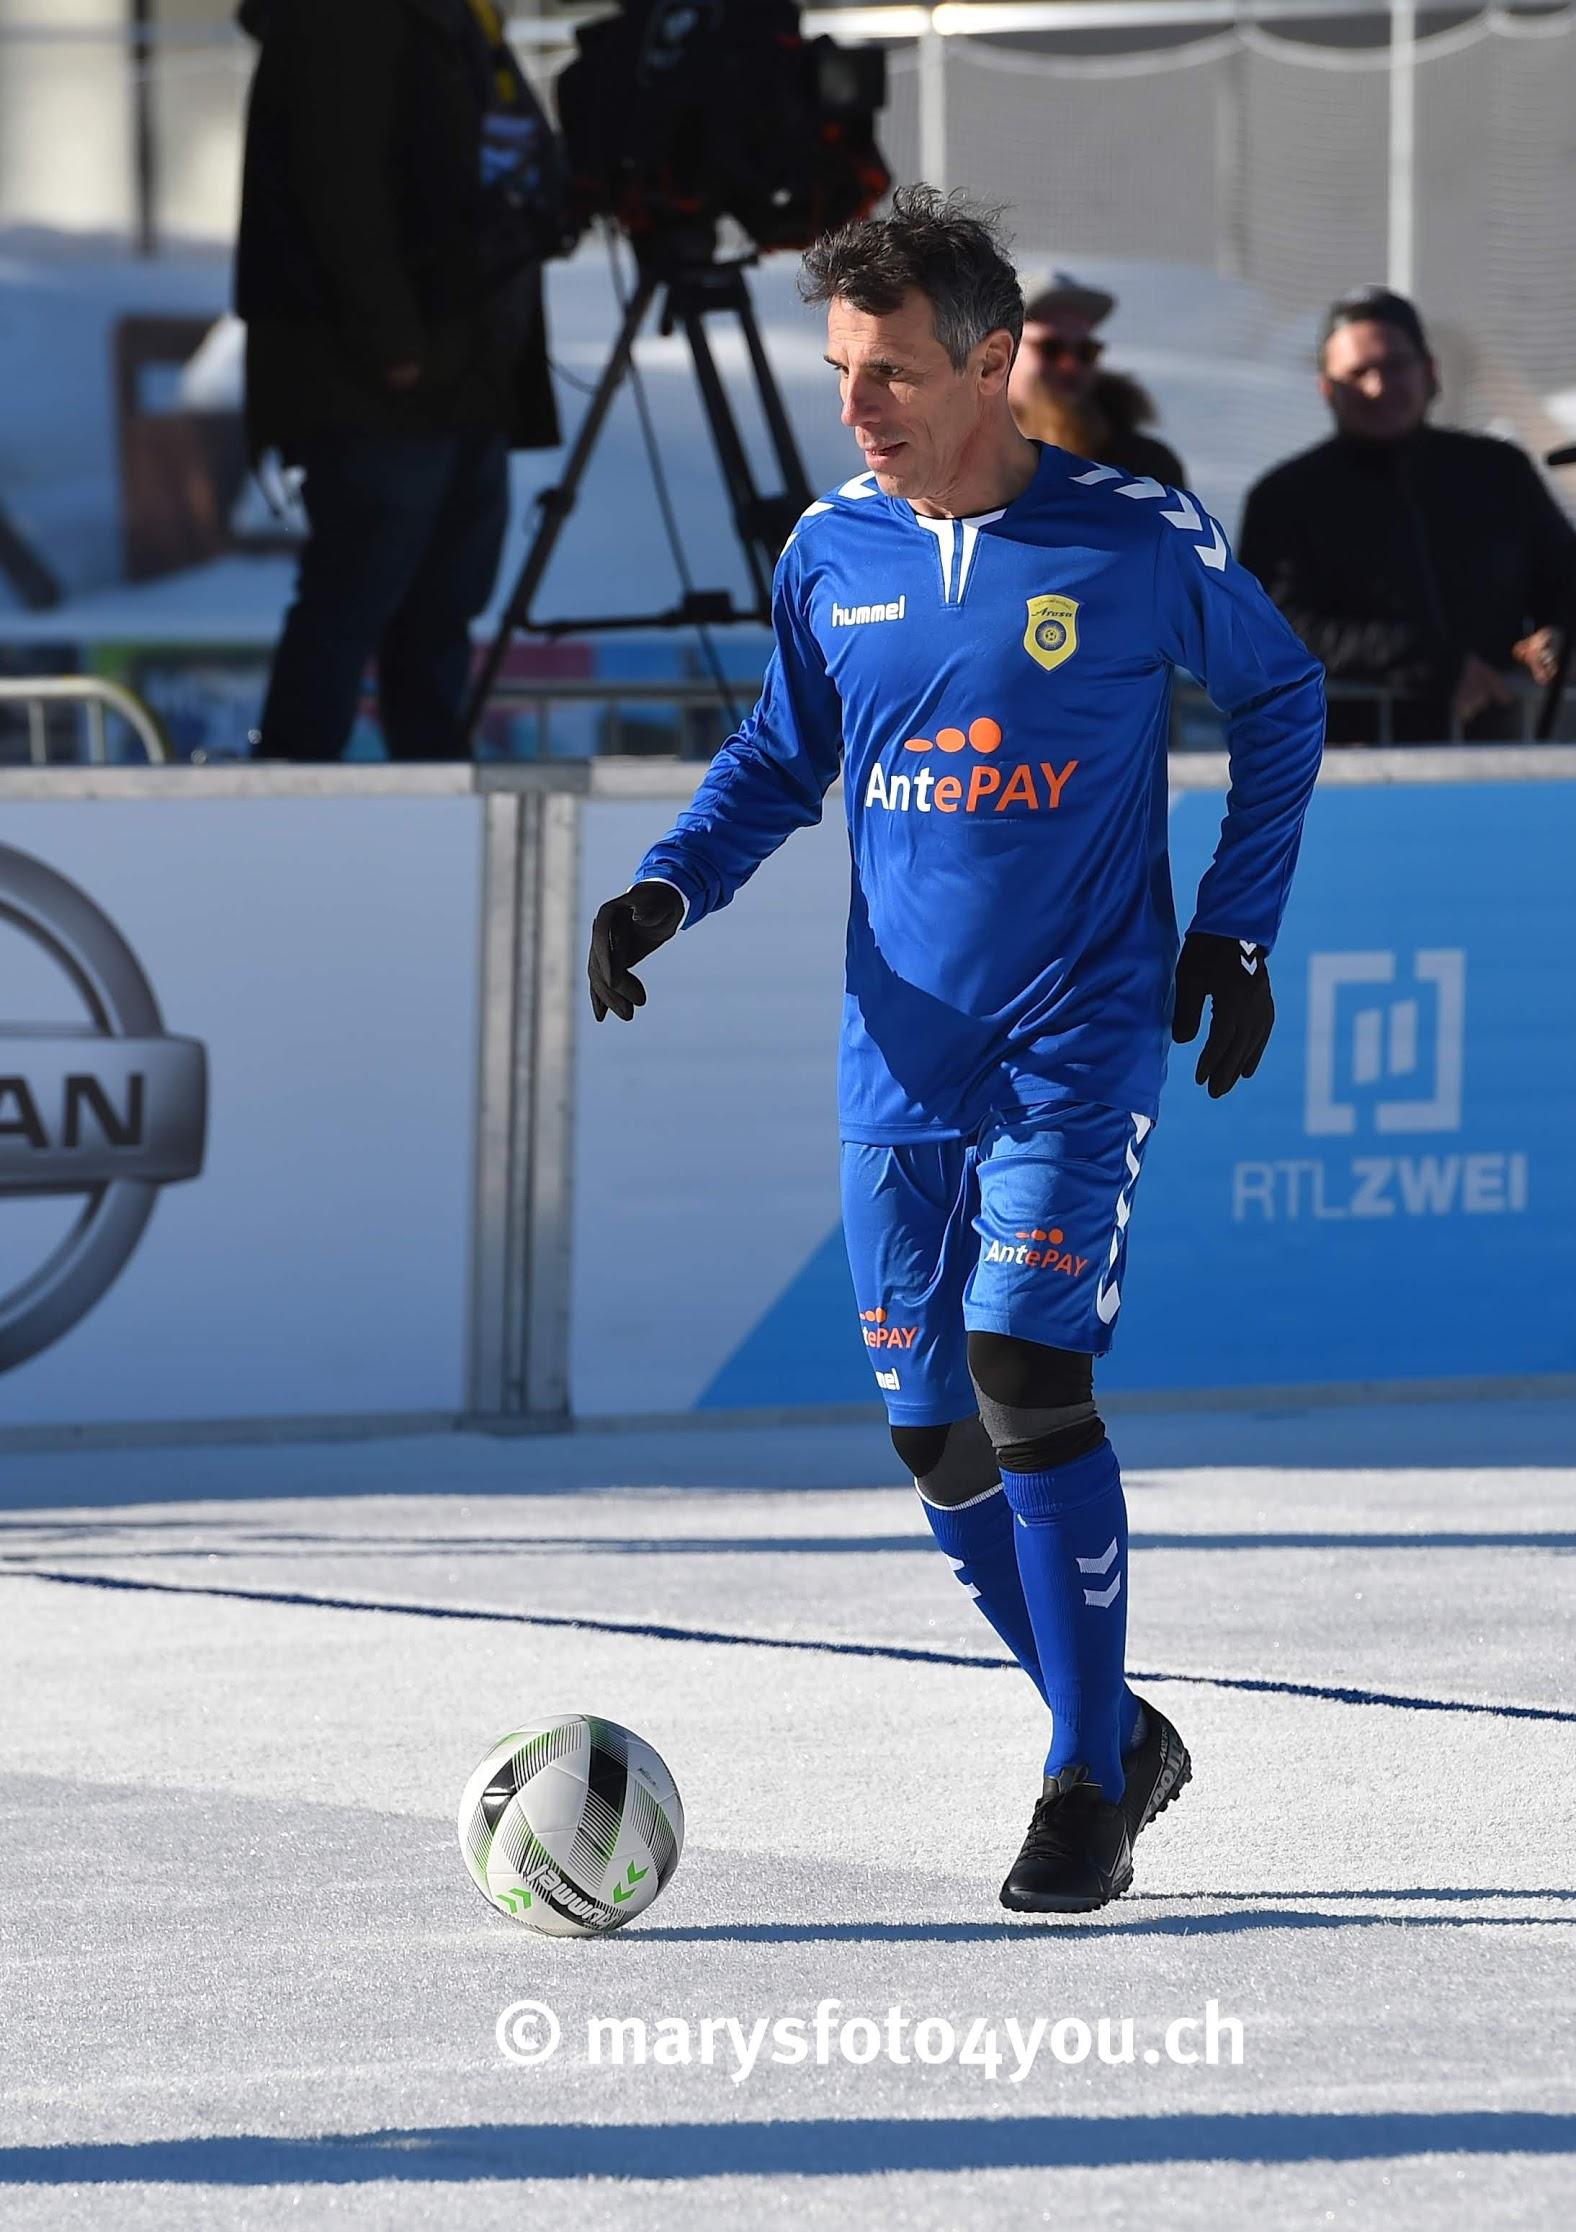 Gianluca Zambrotta - ehem. ital. Nationalspieler